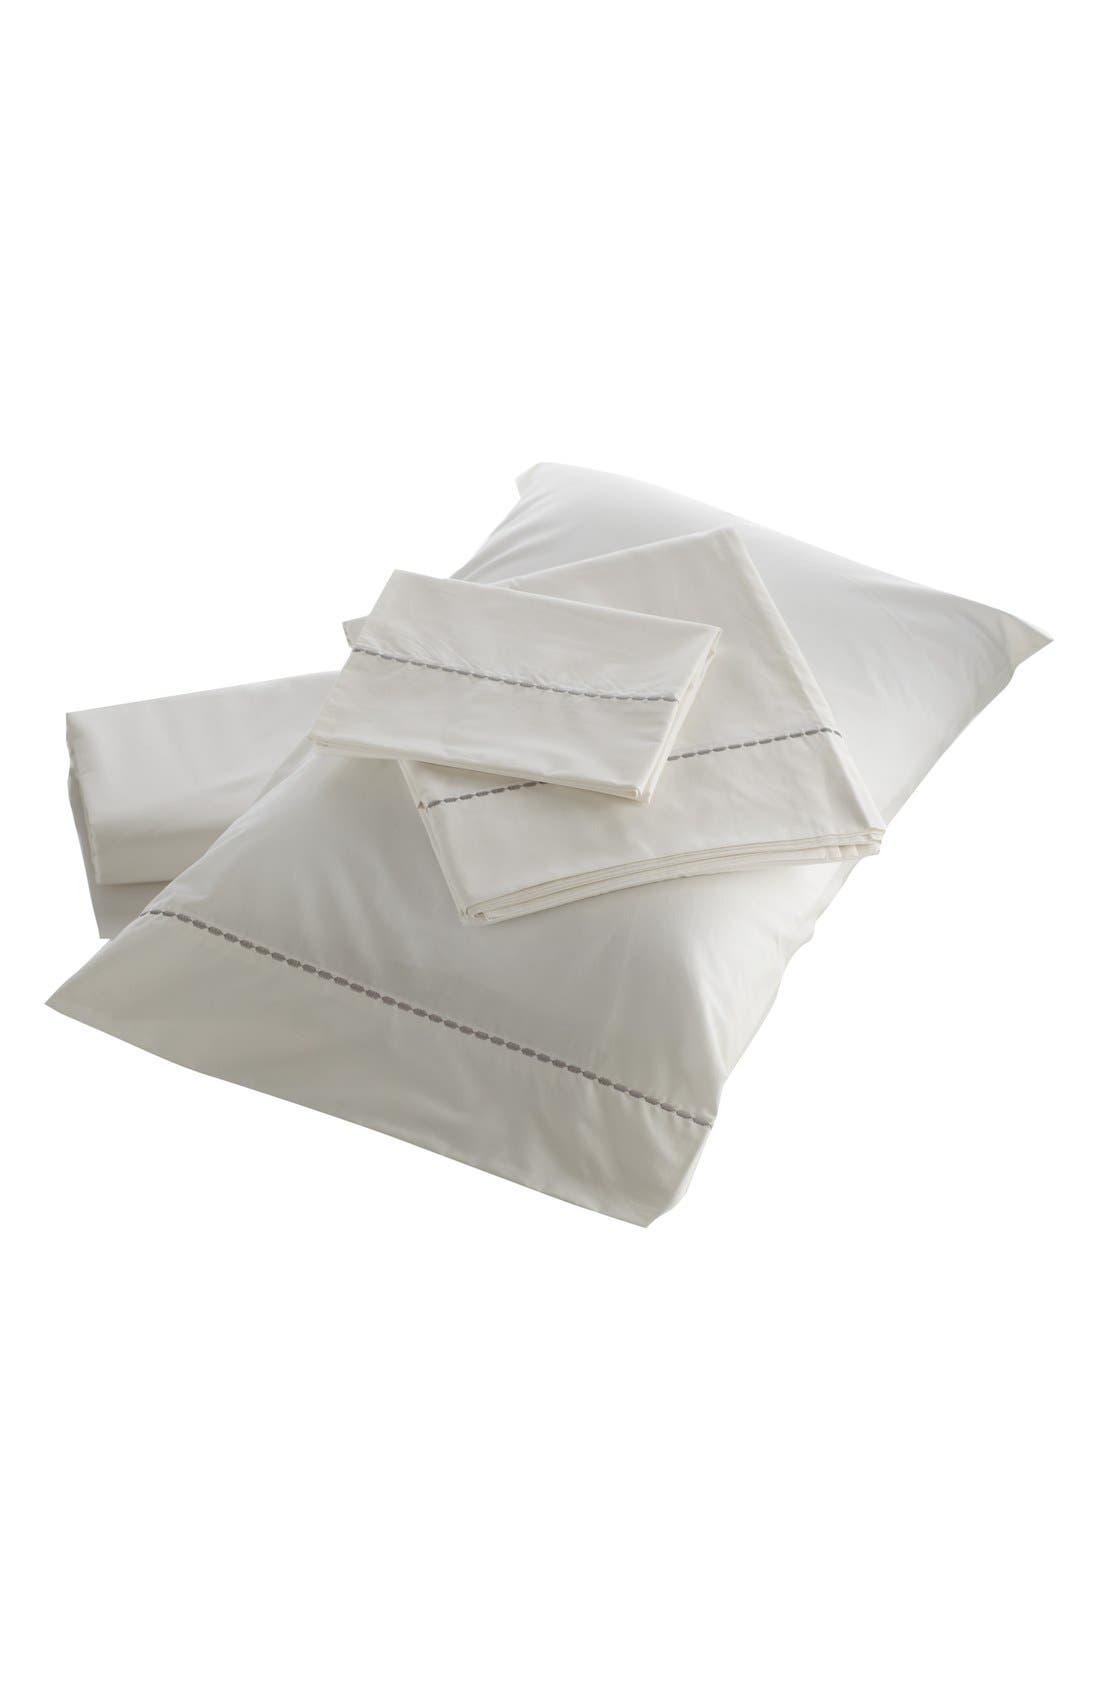 'Portland' 200 Thread Count Organic Cotton Sheet Set,                             Main thumbnail 1, color,                             White